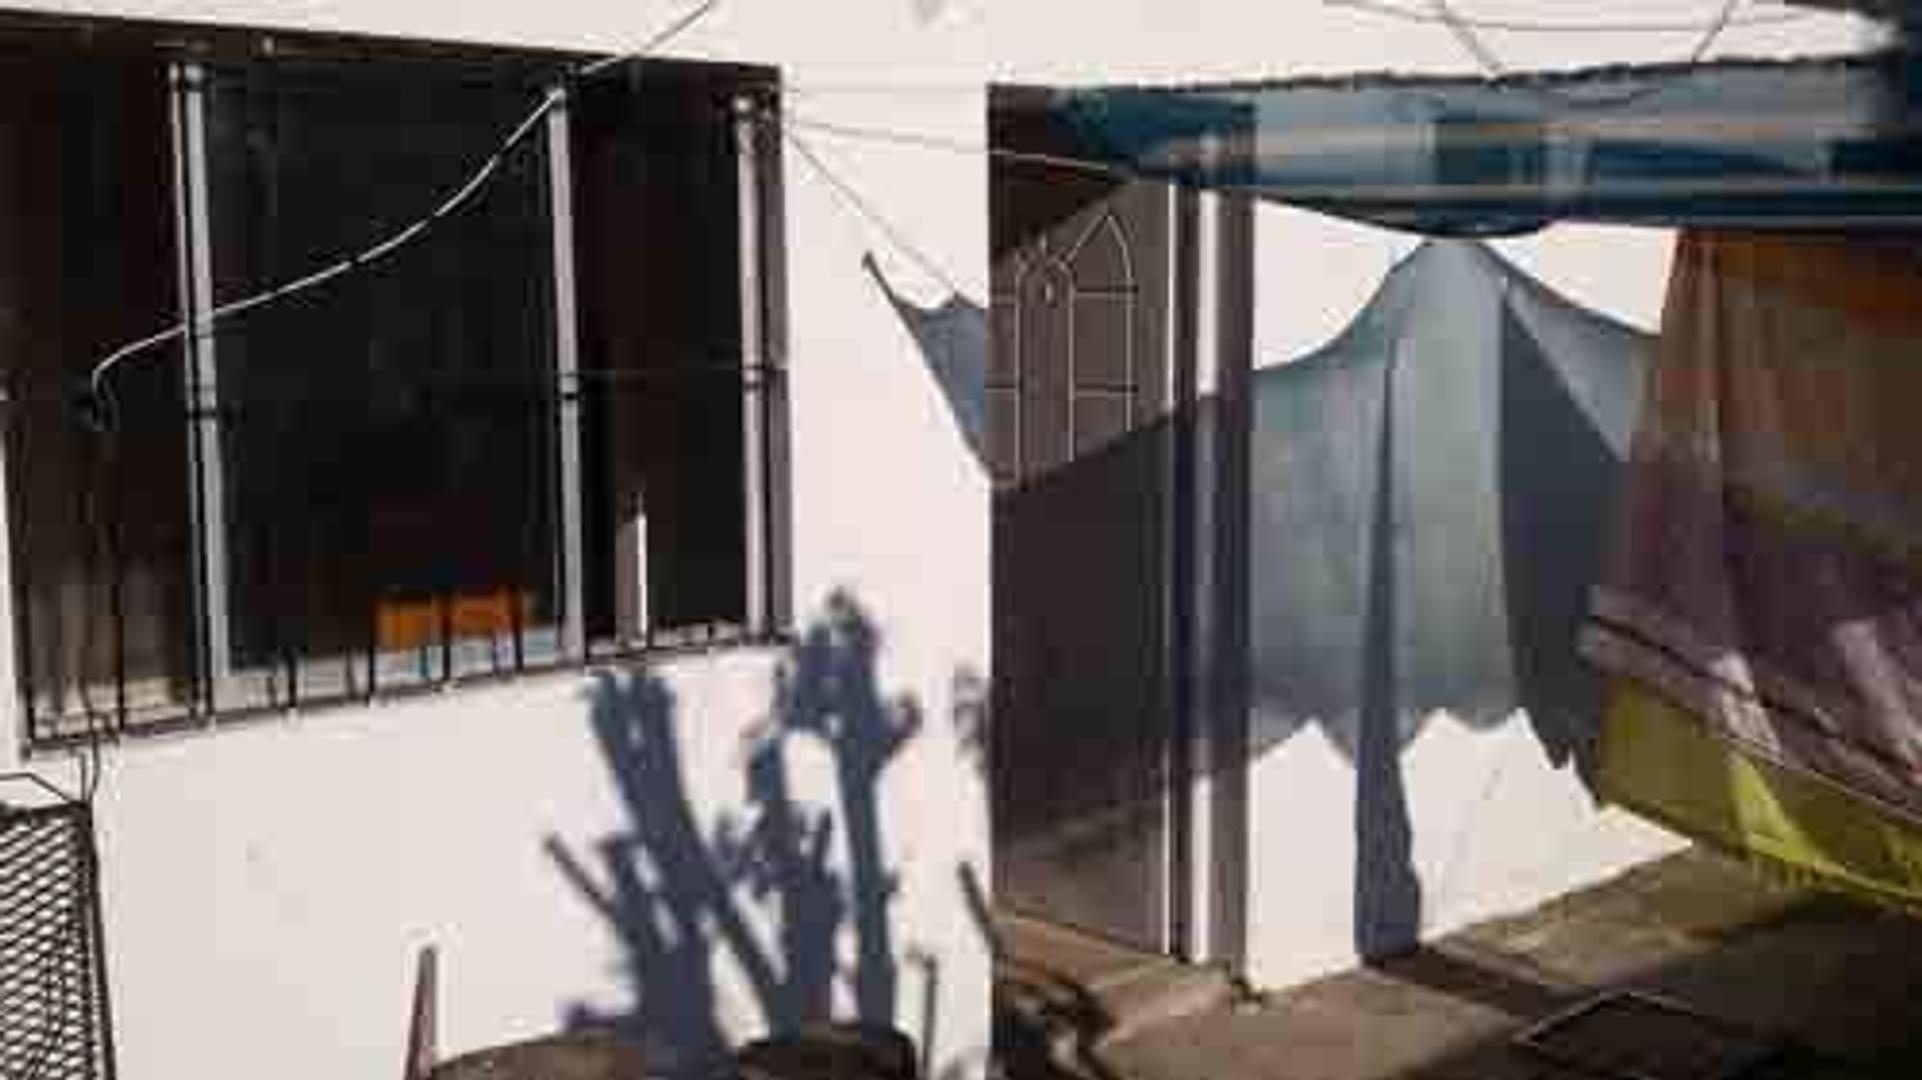 XINTEL(INB-INB-2158) Departamento - Alquiler - Argentina, Berazategui - CALLE AV RANELAGH 3571